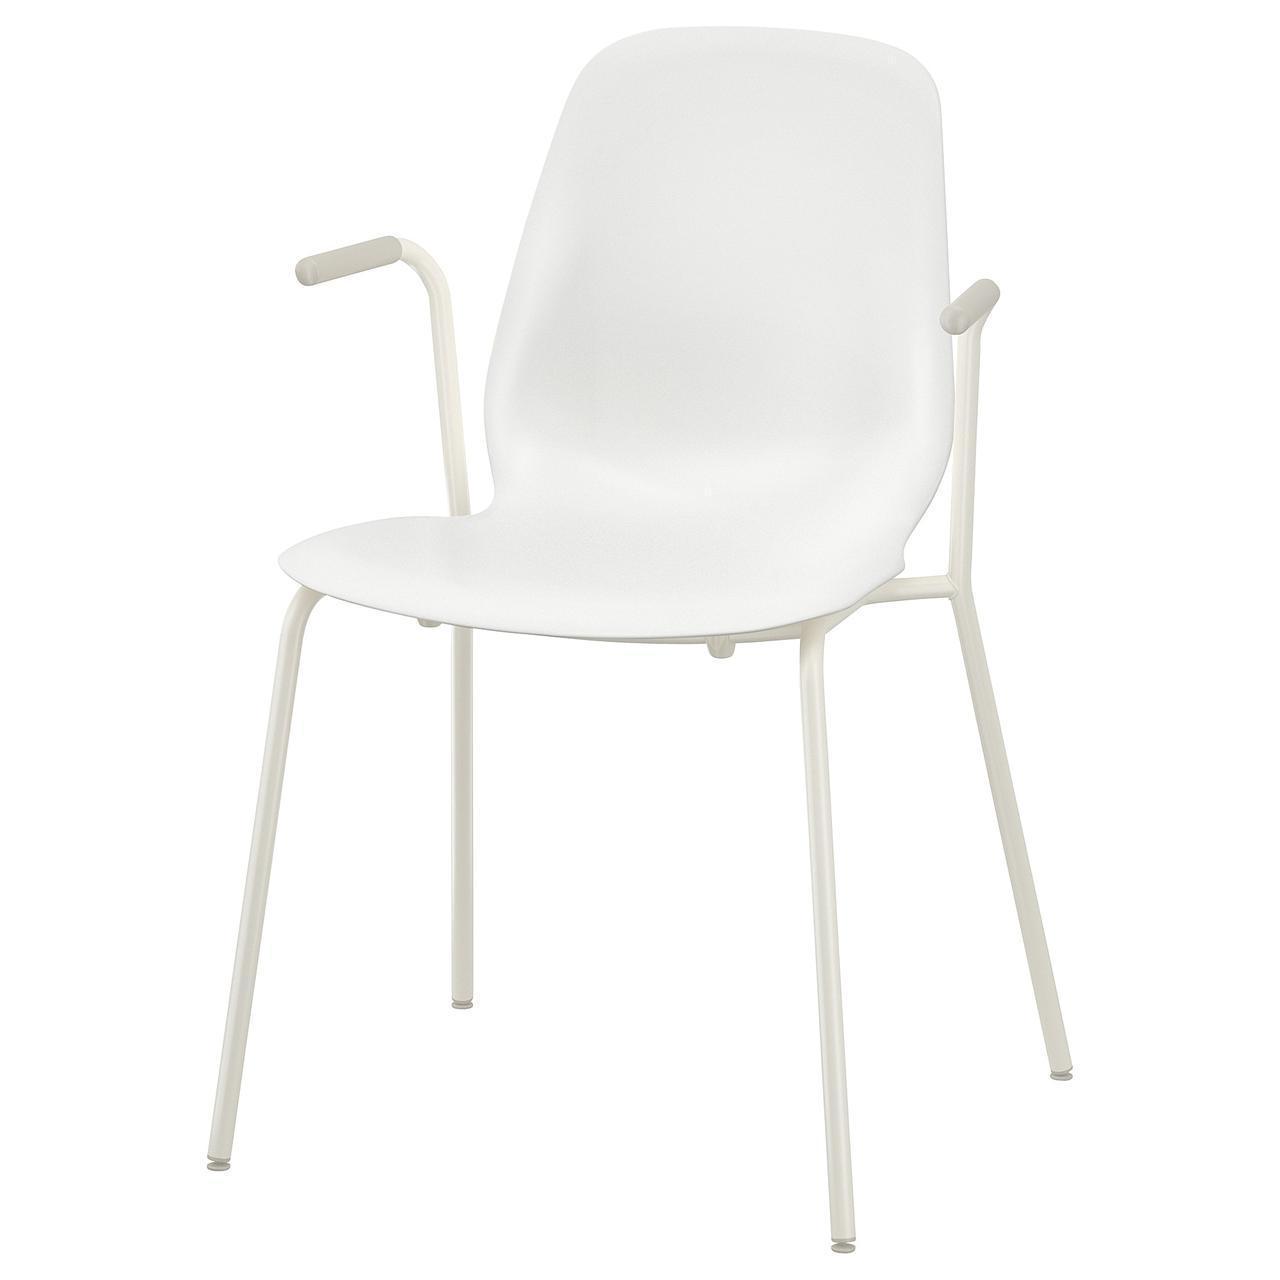 IKEA LEIFARNE Стул с подлокотниками, белый, Дитмар белый  (592.597.52)